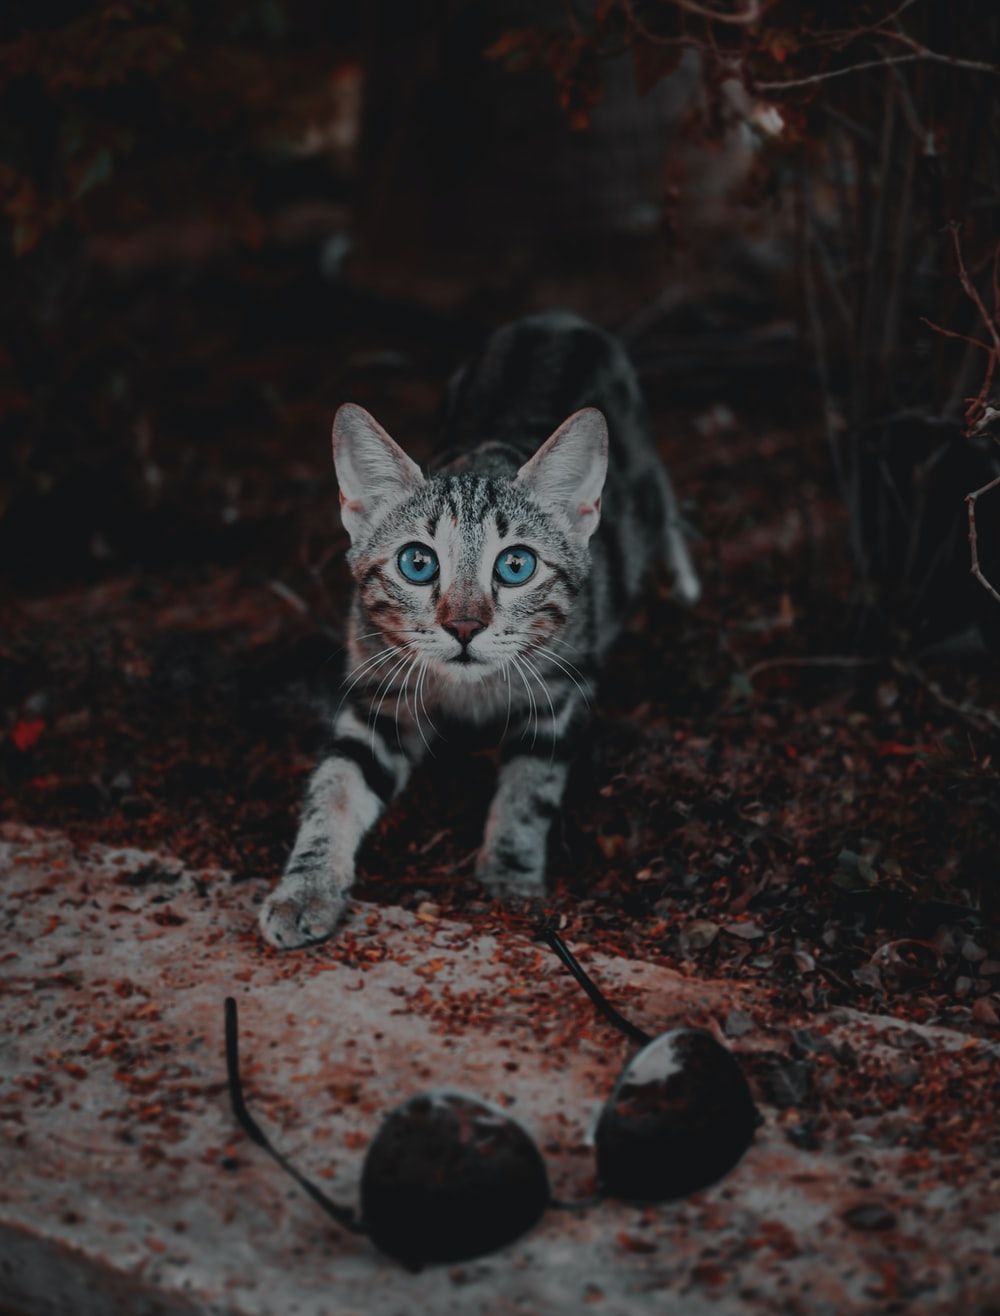 bengal cat with blue eyes near aviator-style sunglasses